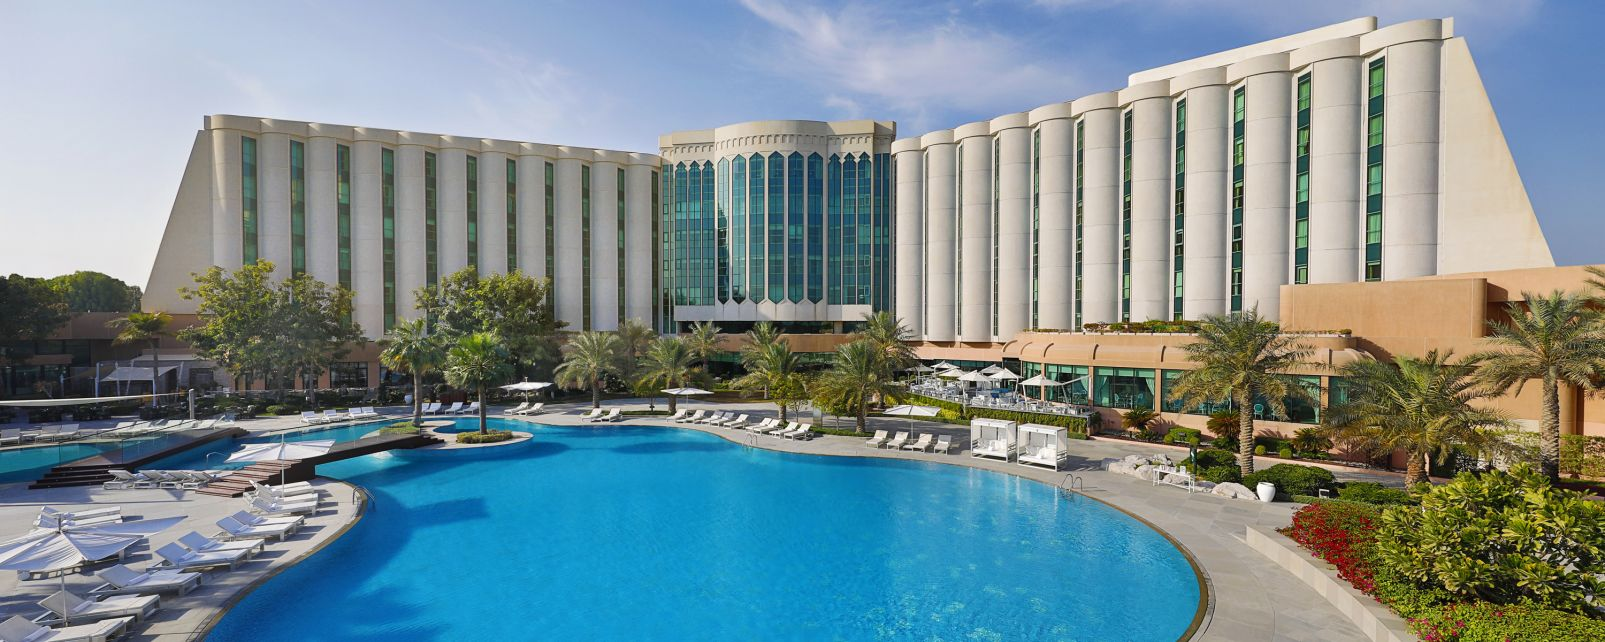 Hôtel Ritz Carlton Bahrain & Spa